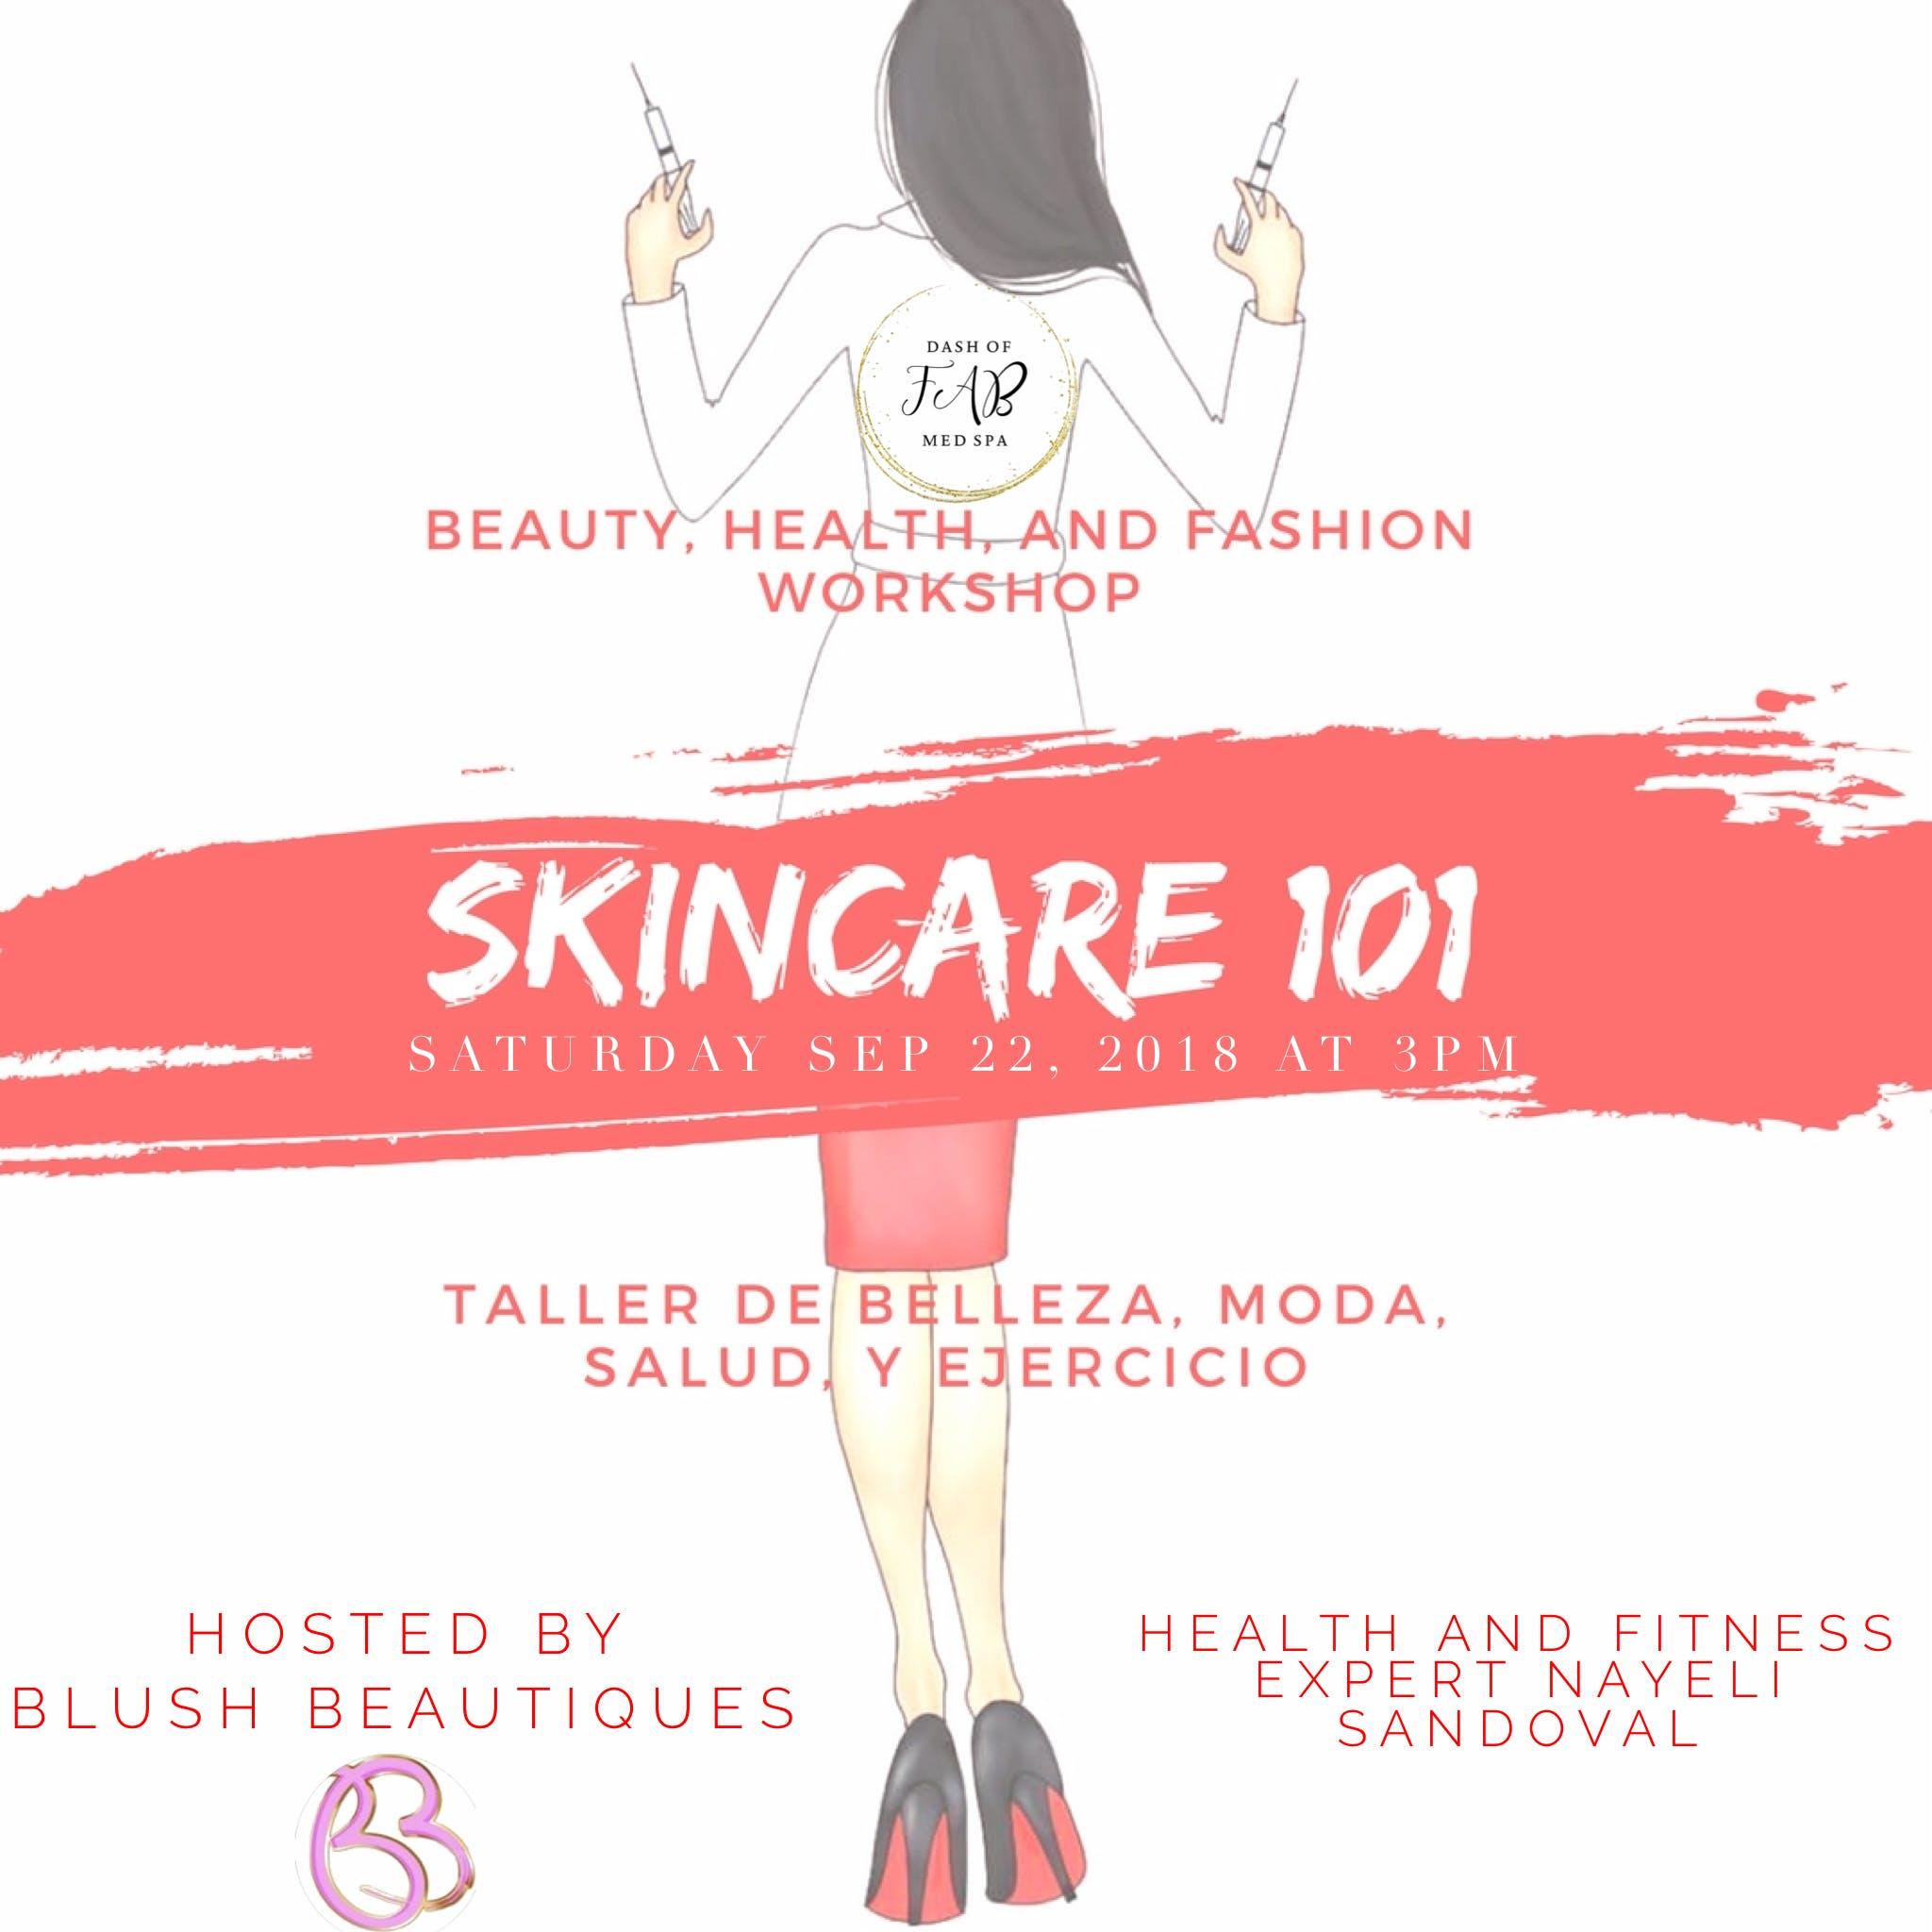 Beauty, Fashion, and Health Workshop